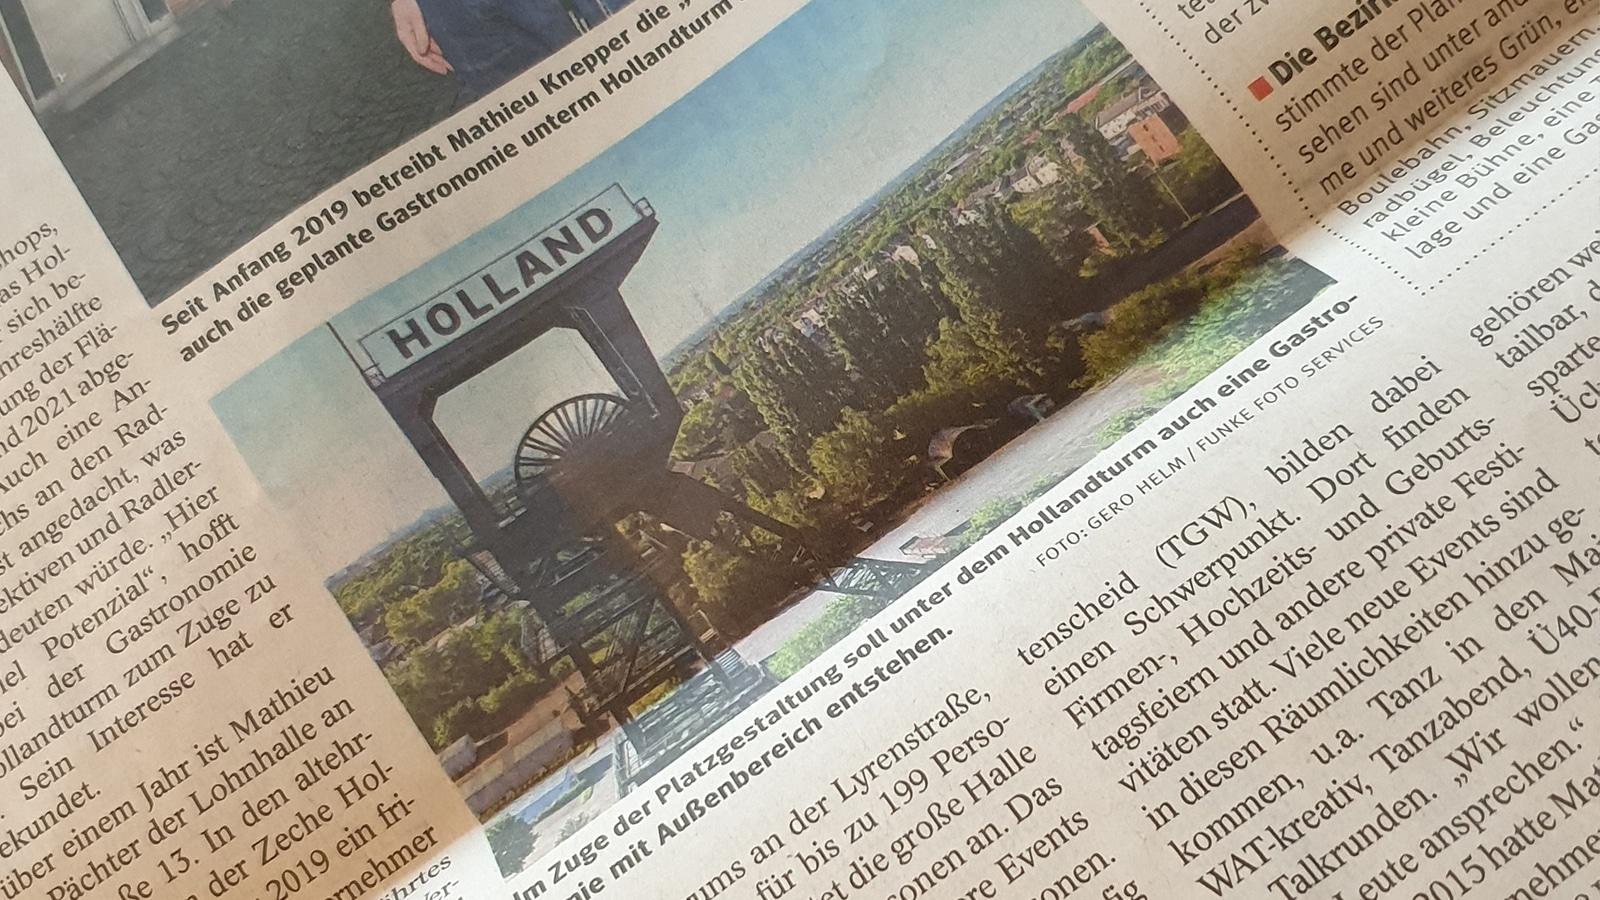 Knepper Management - Presse - WAZ - Hollandturm Gastronomie geplant